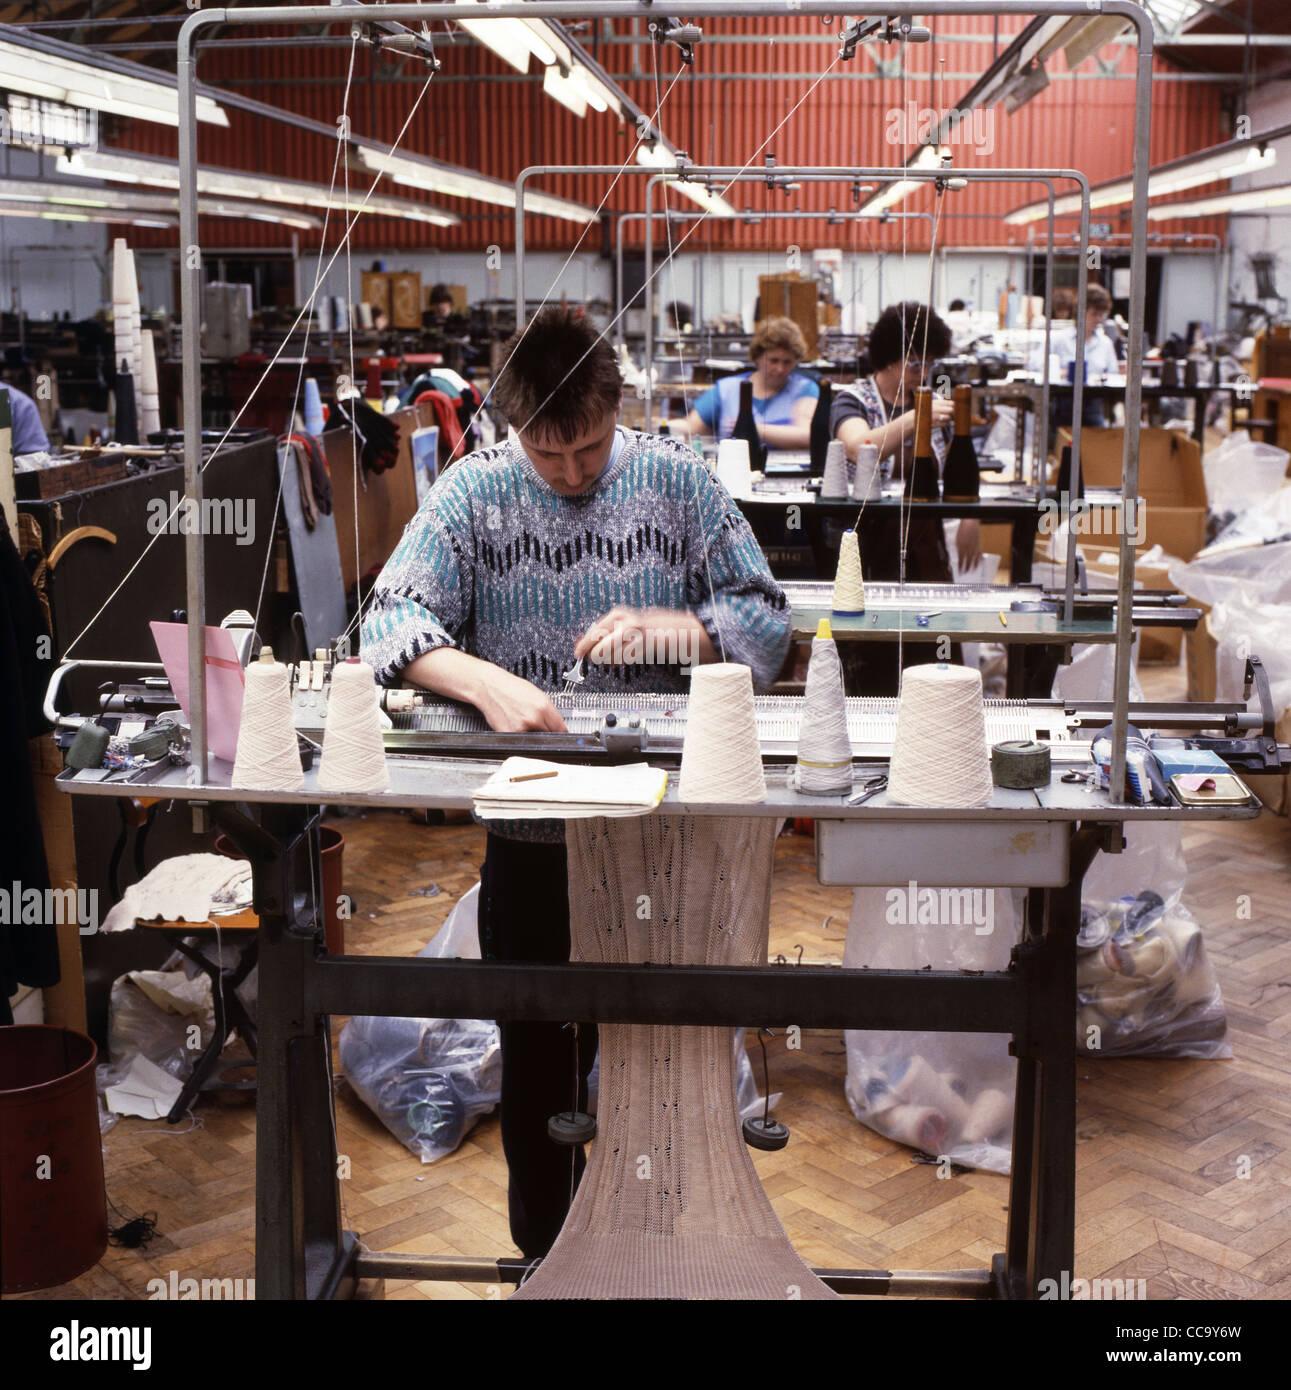 Knitting Jobs Uk : Workers working on knitting machines at the corgi hosiery